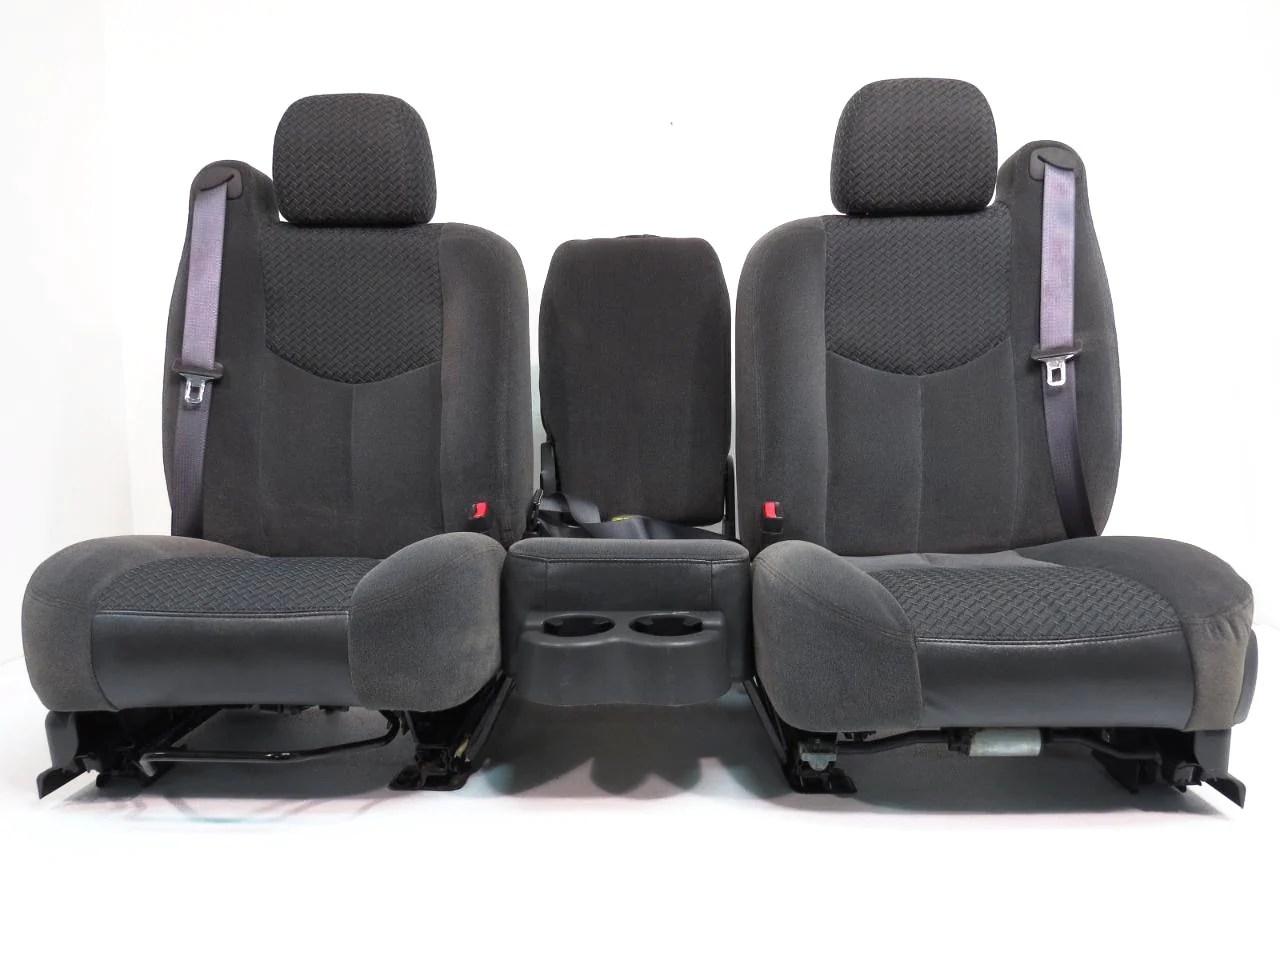 medium resolution of chevy gmc truck suv dark grey cloth front seats 2000 2001 2002 2003 2004 2005 2006